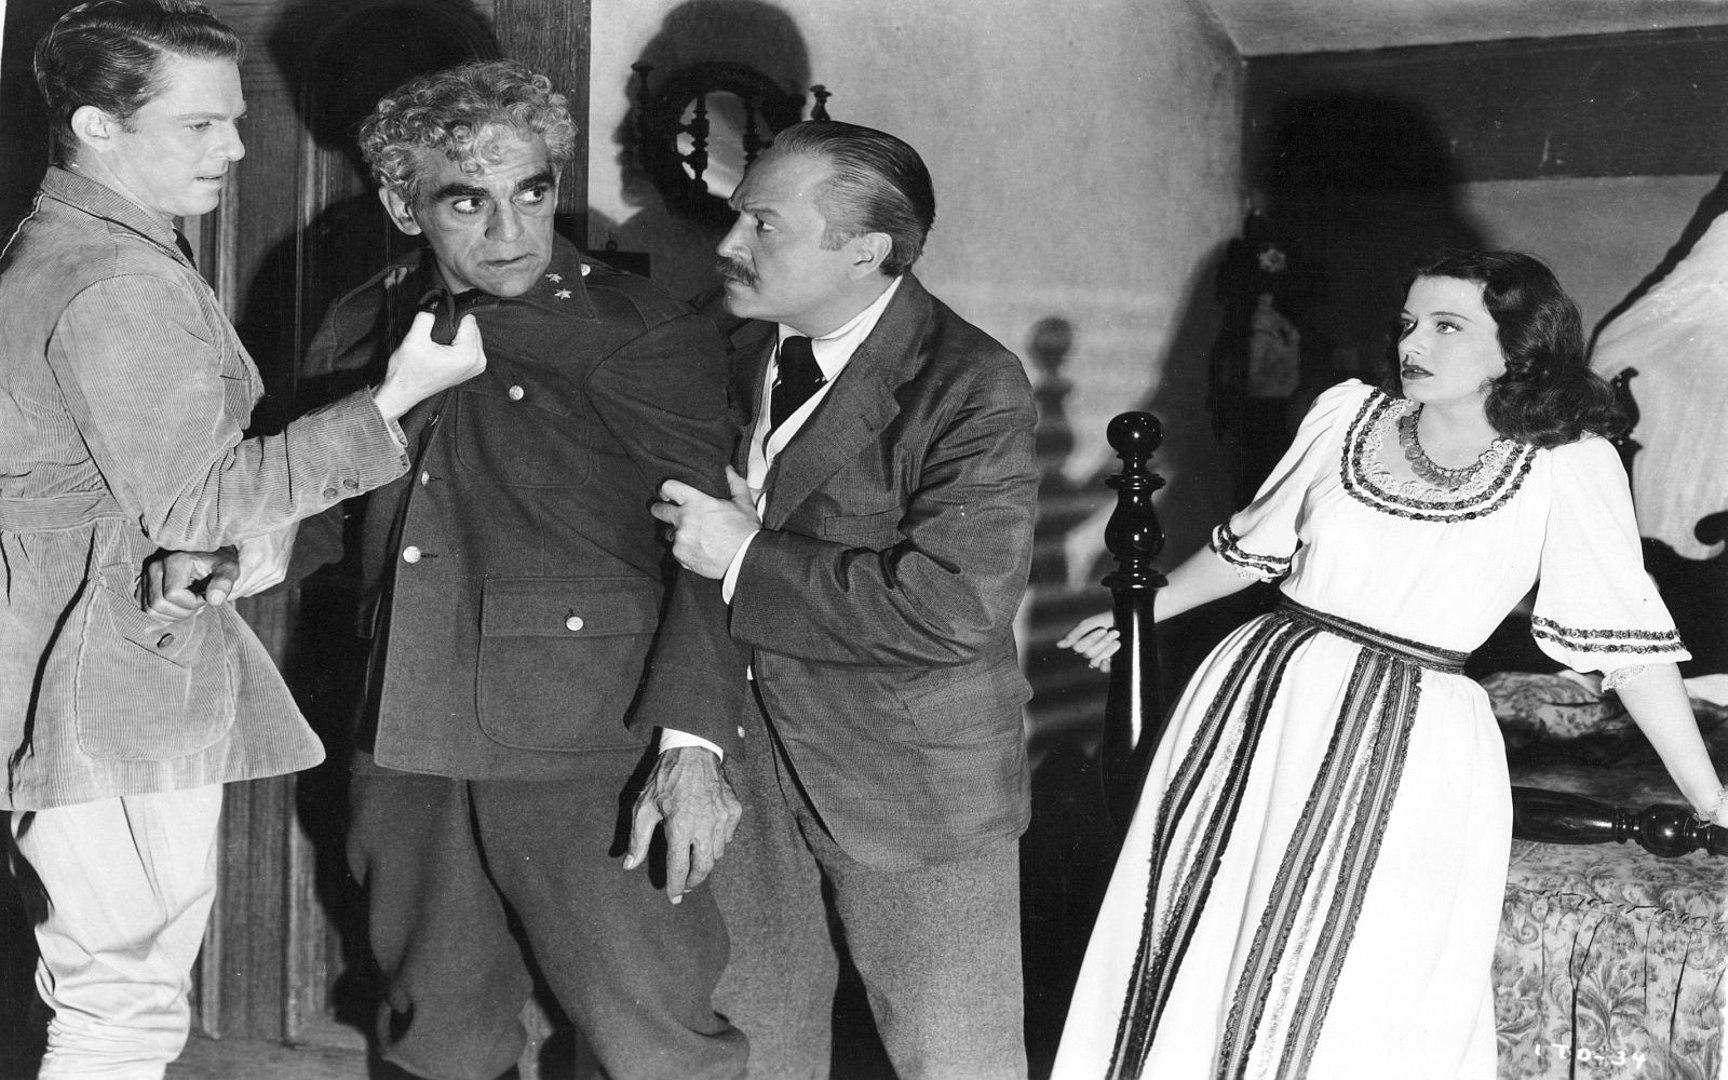 Boris Karloff in Val Lewton Mark Robson horror Isle of the Dead